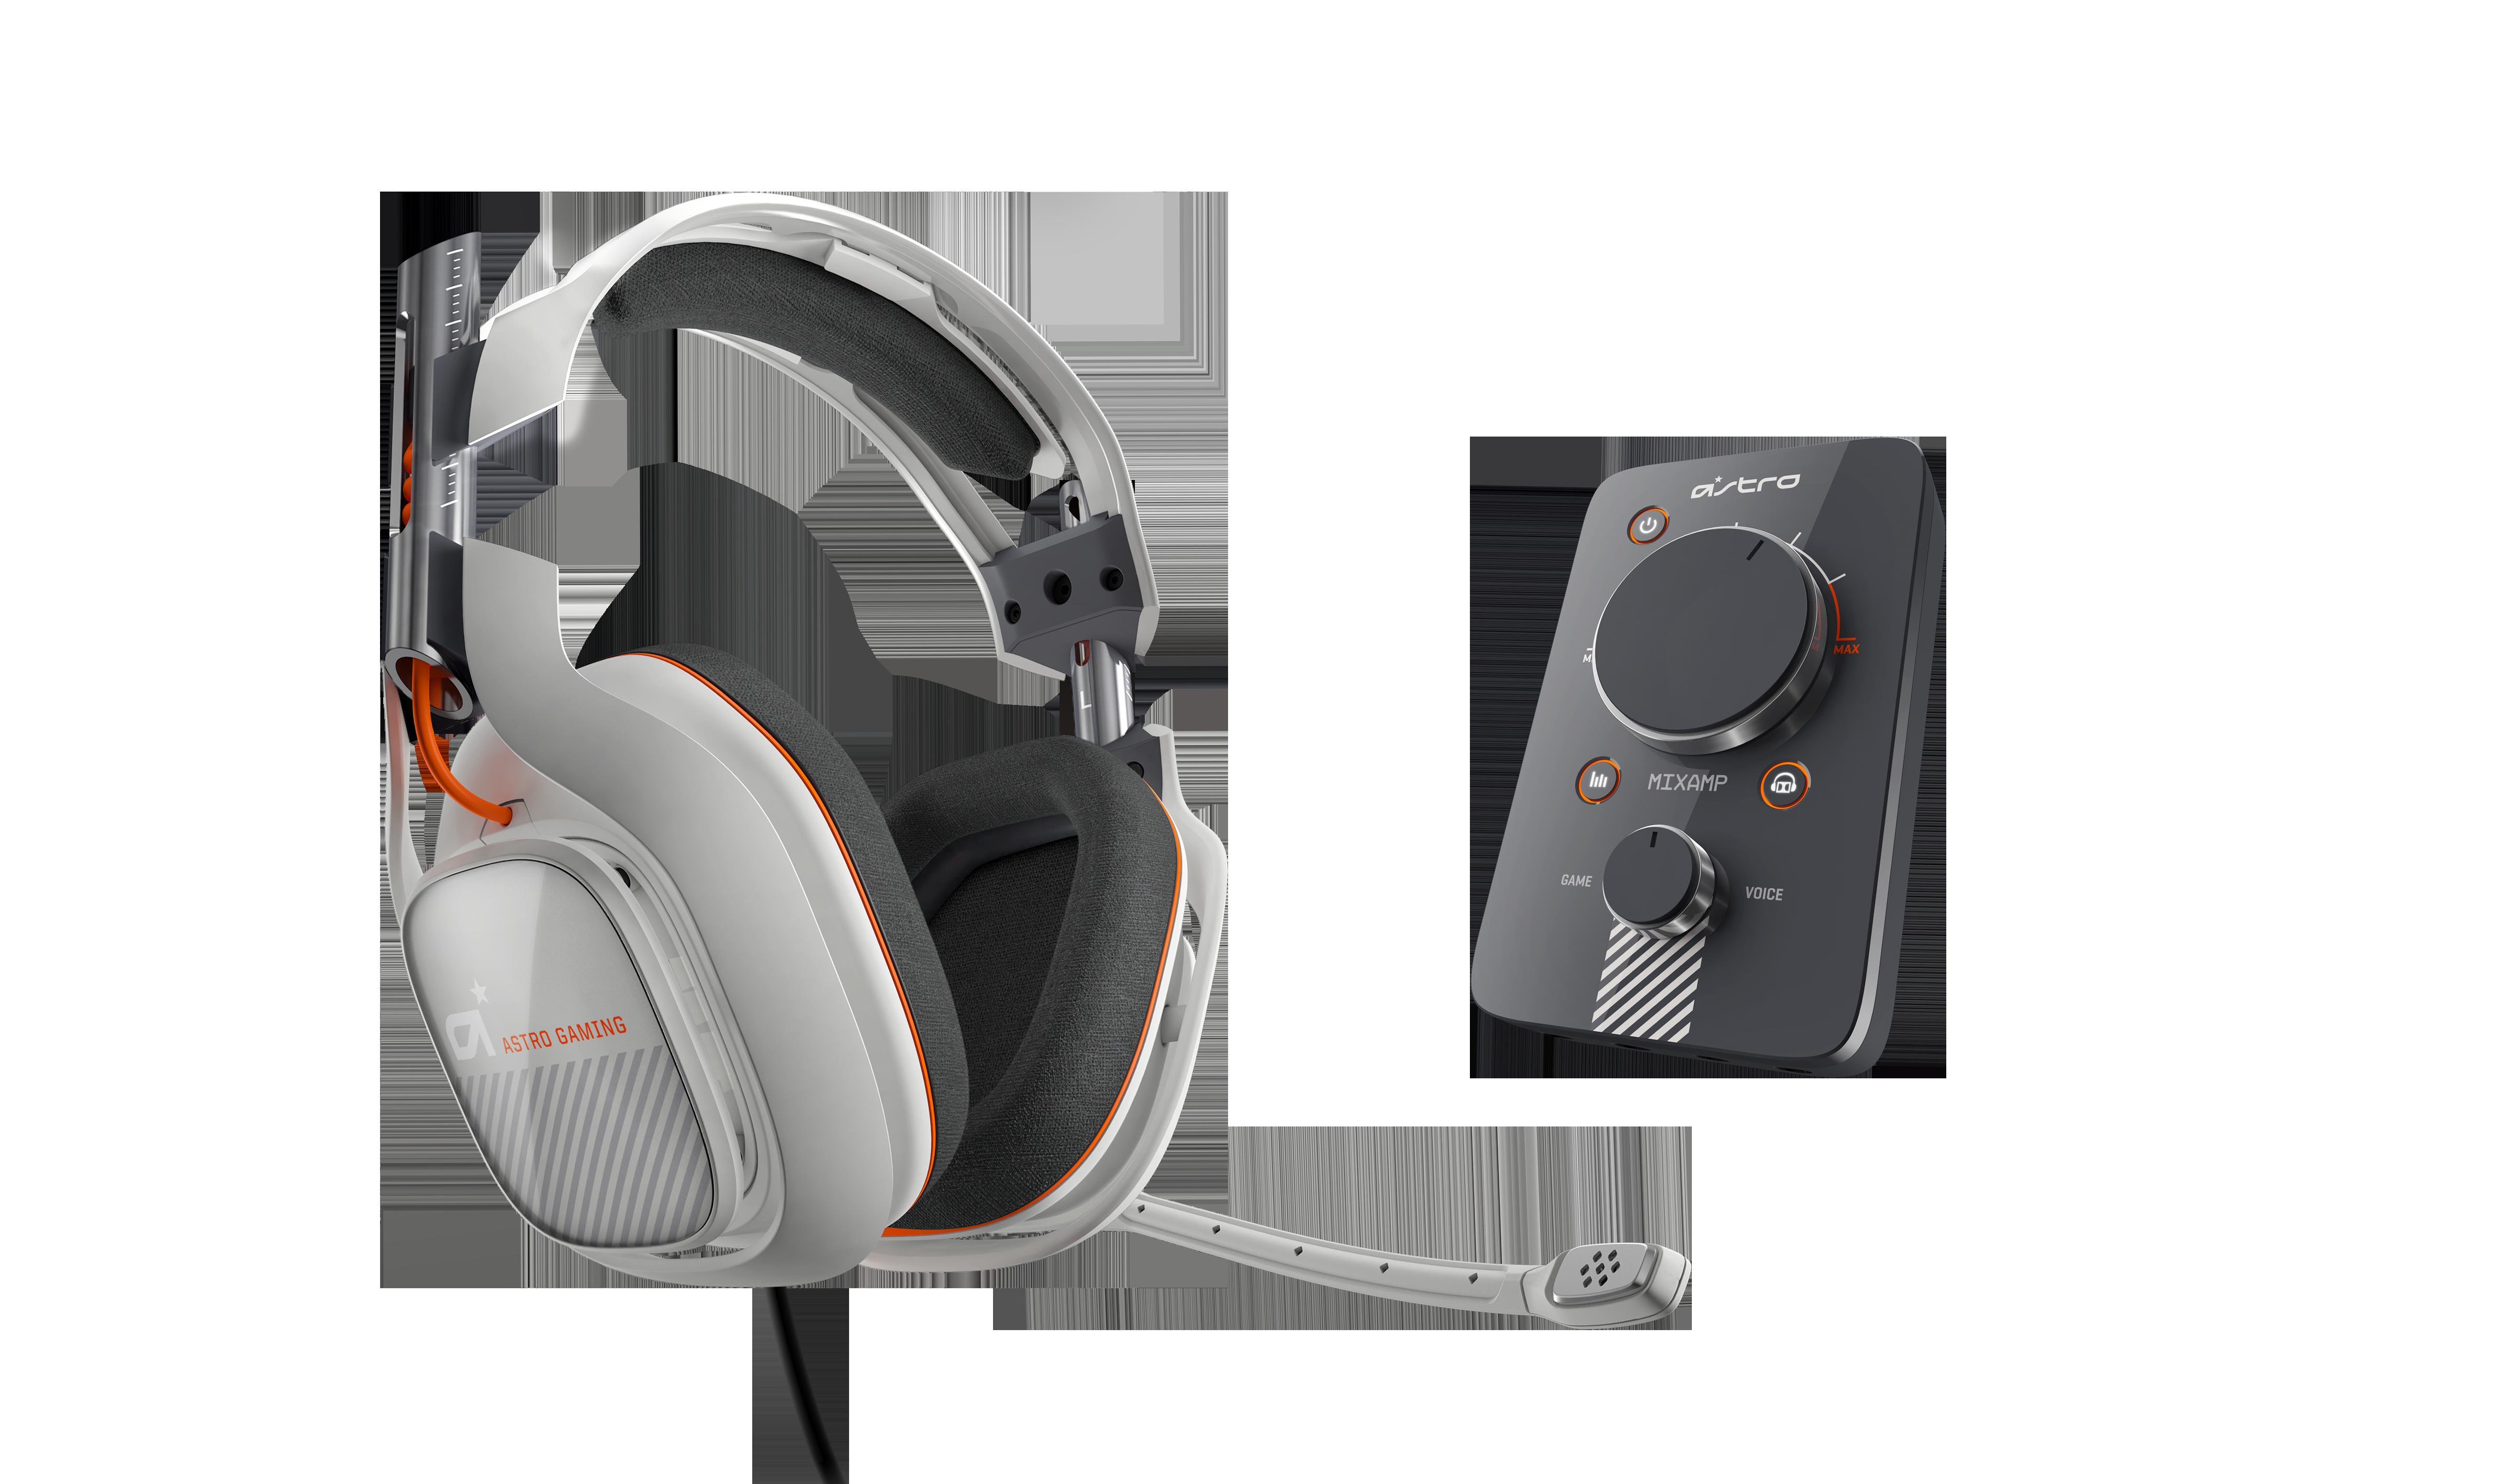 Astro headset clipart.